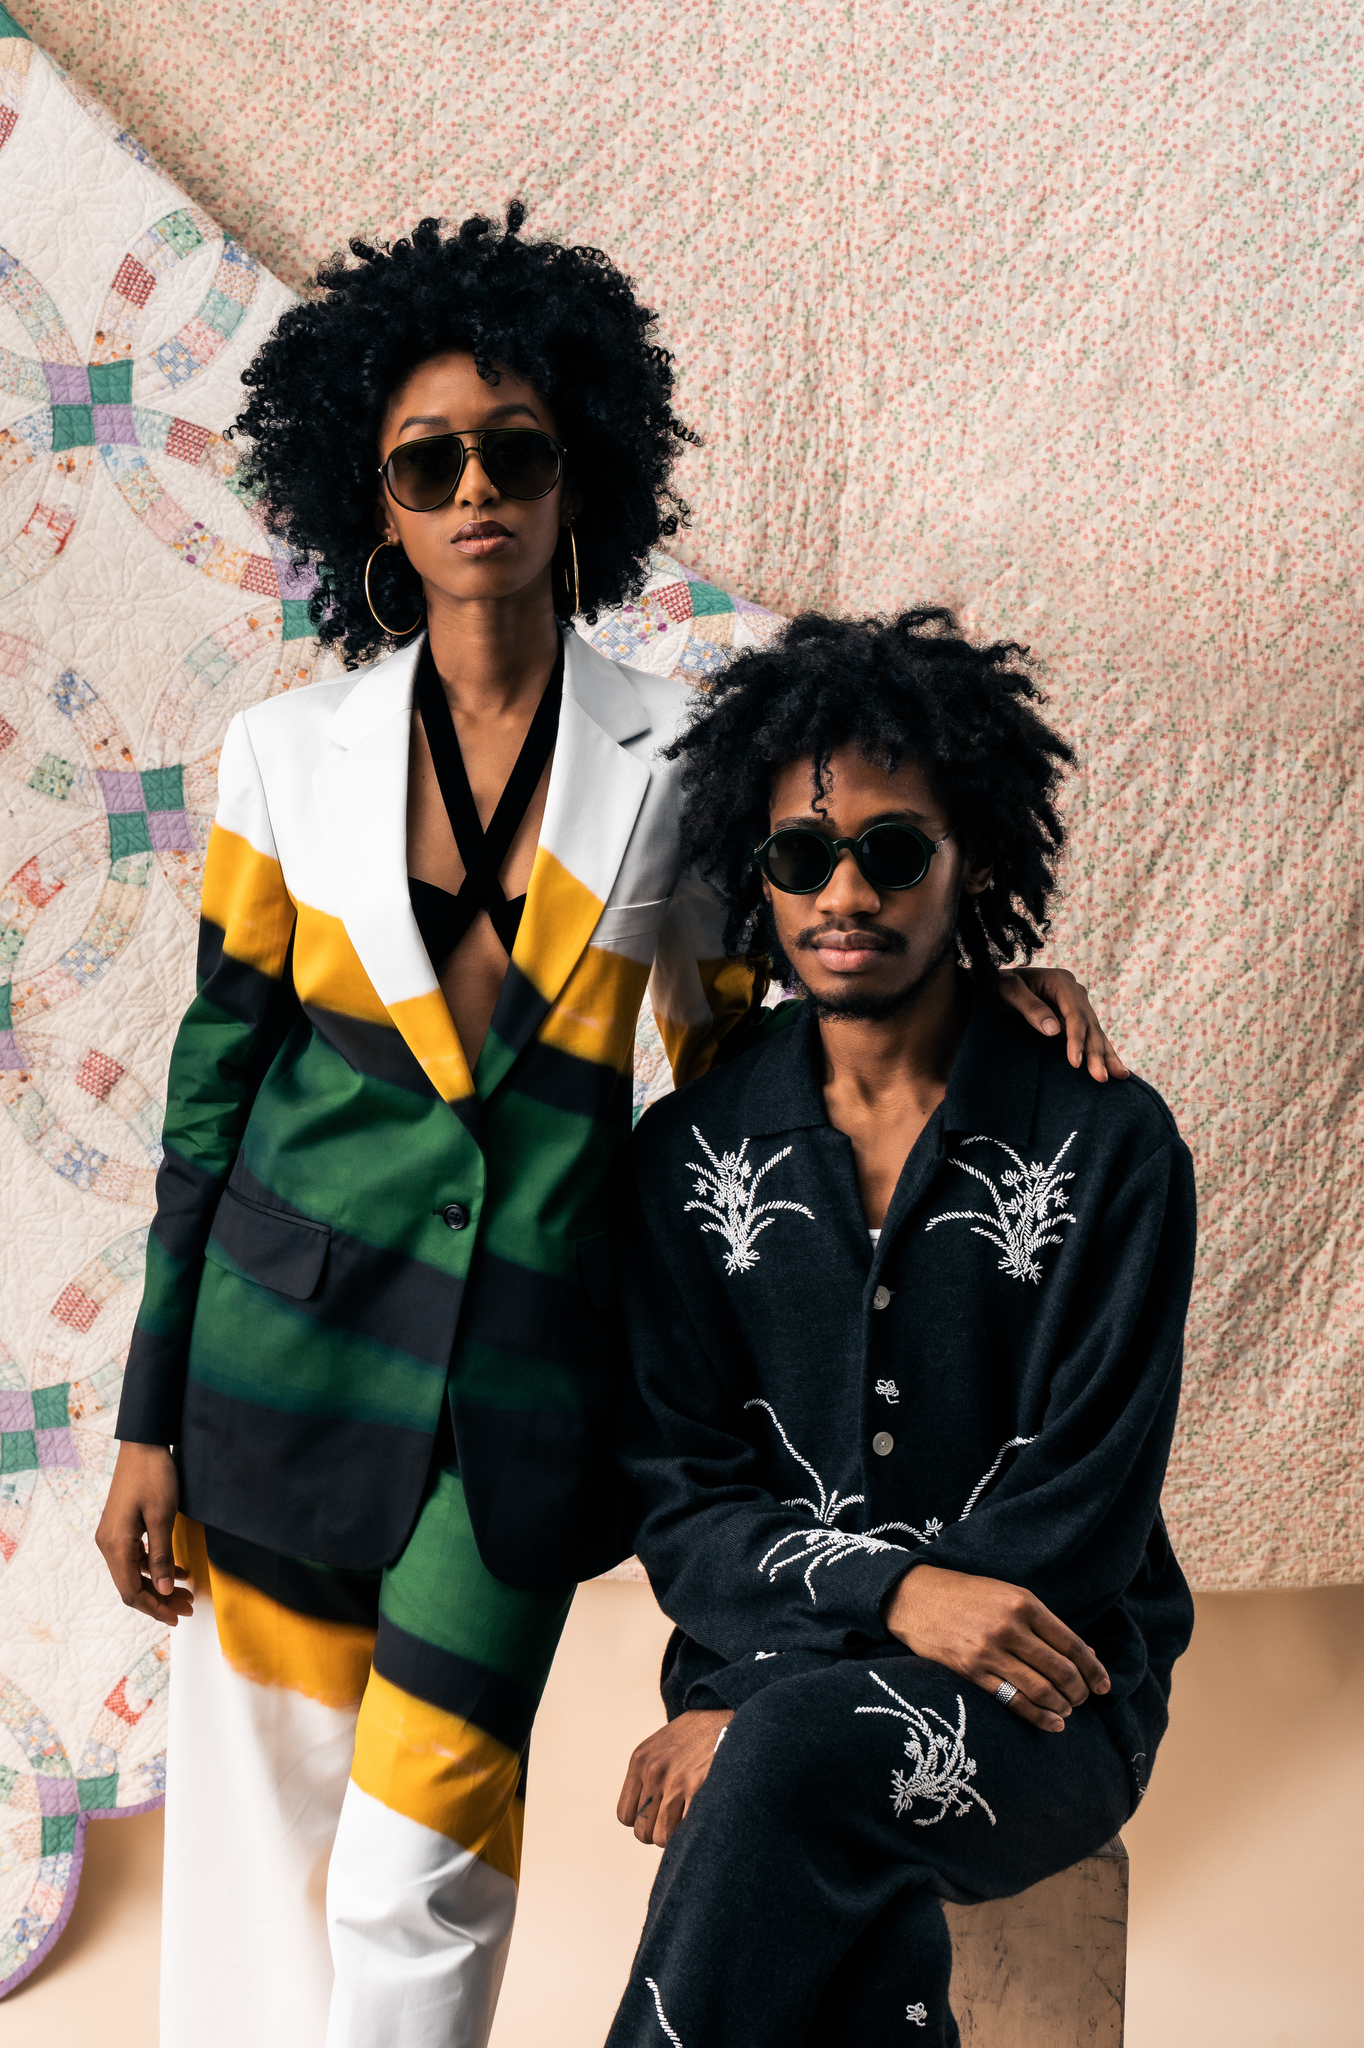 Marcus Paul's sunglasses for Haffmans & Neumeister.